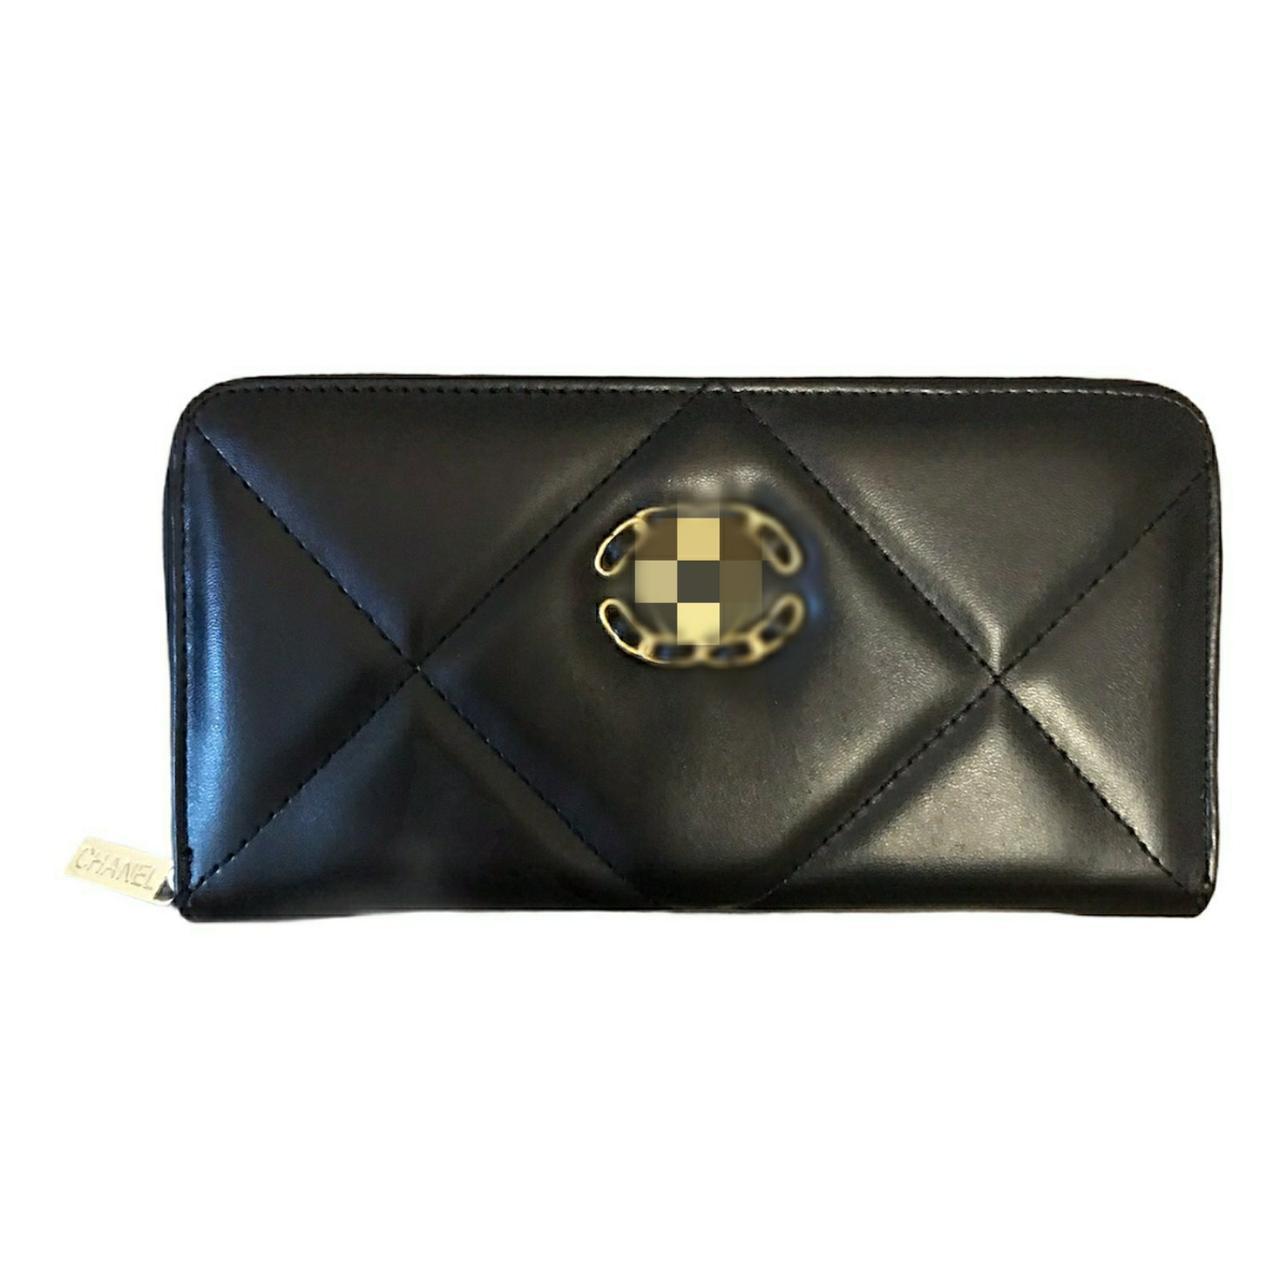 Чорний жіночий гаманець Шанель